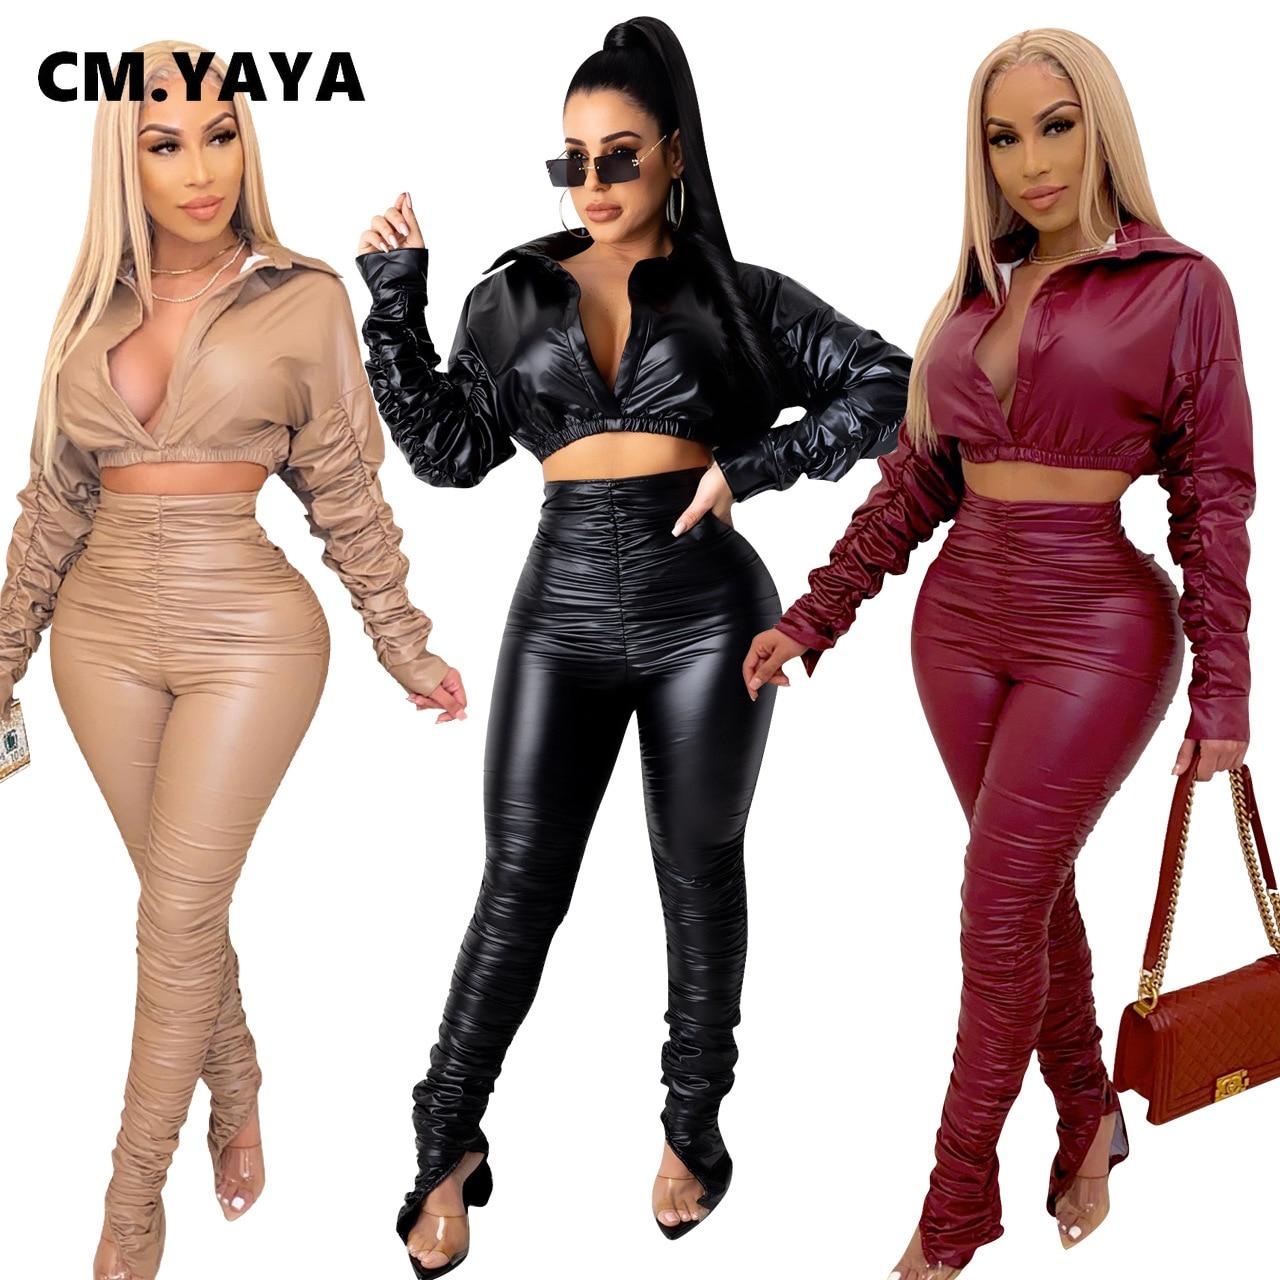 CM.YAYA Casual frauen Set faltig PU Crop Top Hosen Trainingsanzug Fitness Zwei 2 Stück Set Outfit